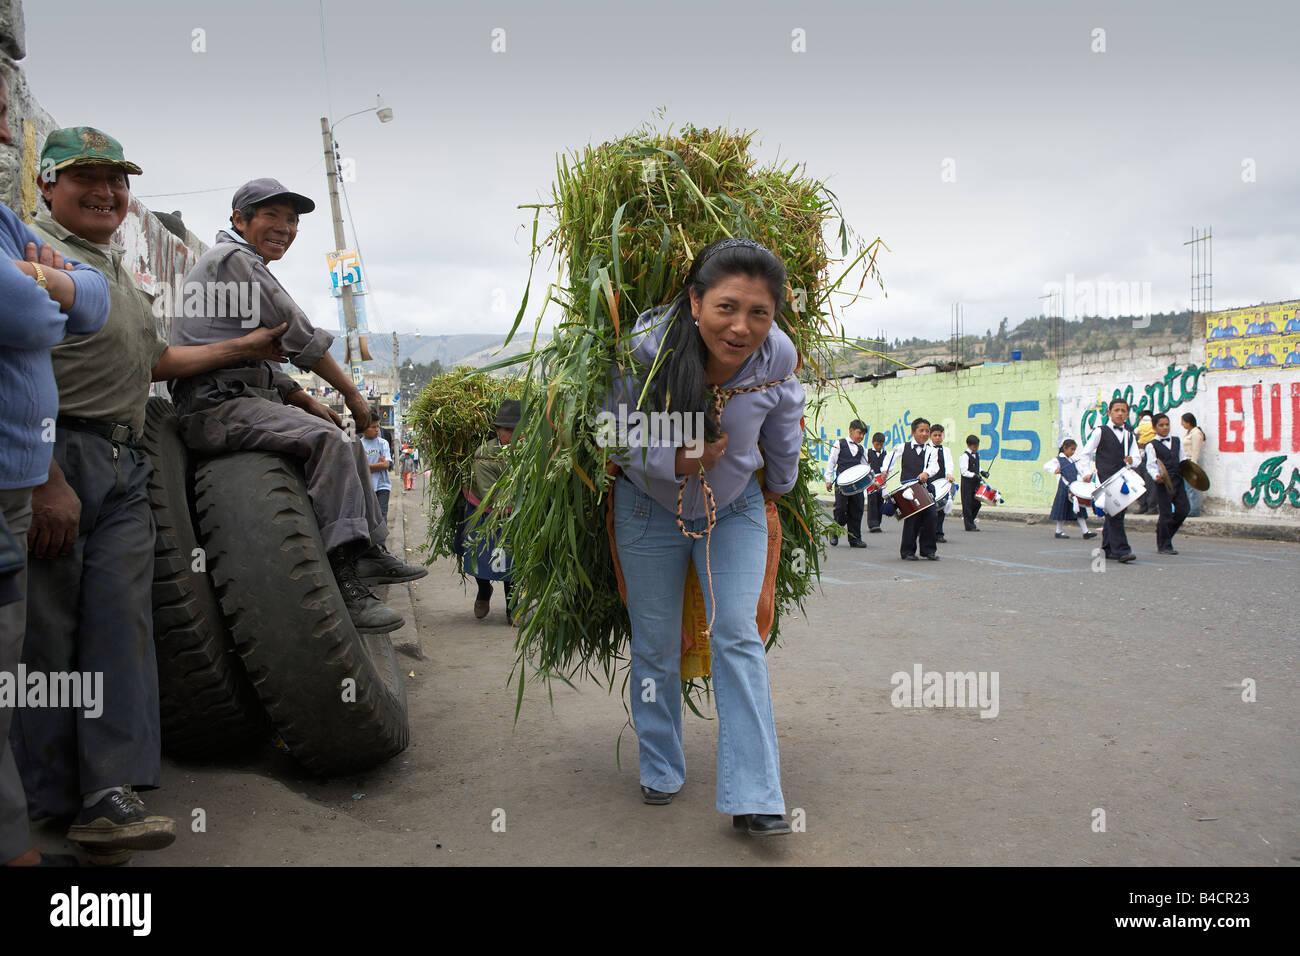 Woman carrying grass for animals, Otavalo Ecuador - Stock Image